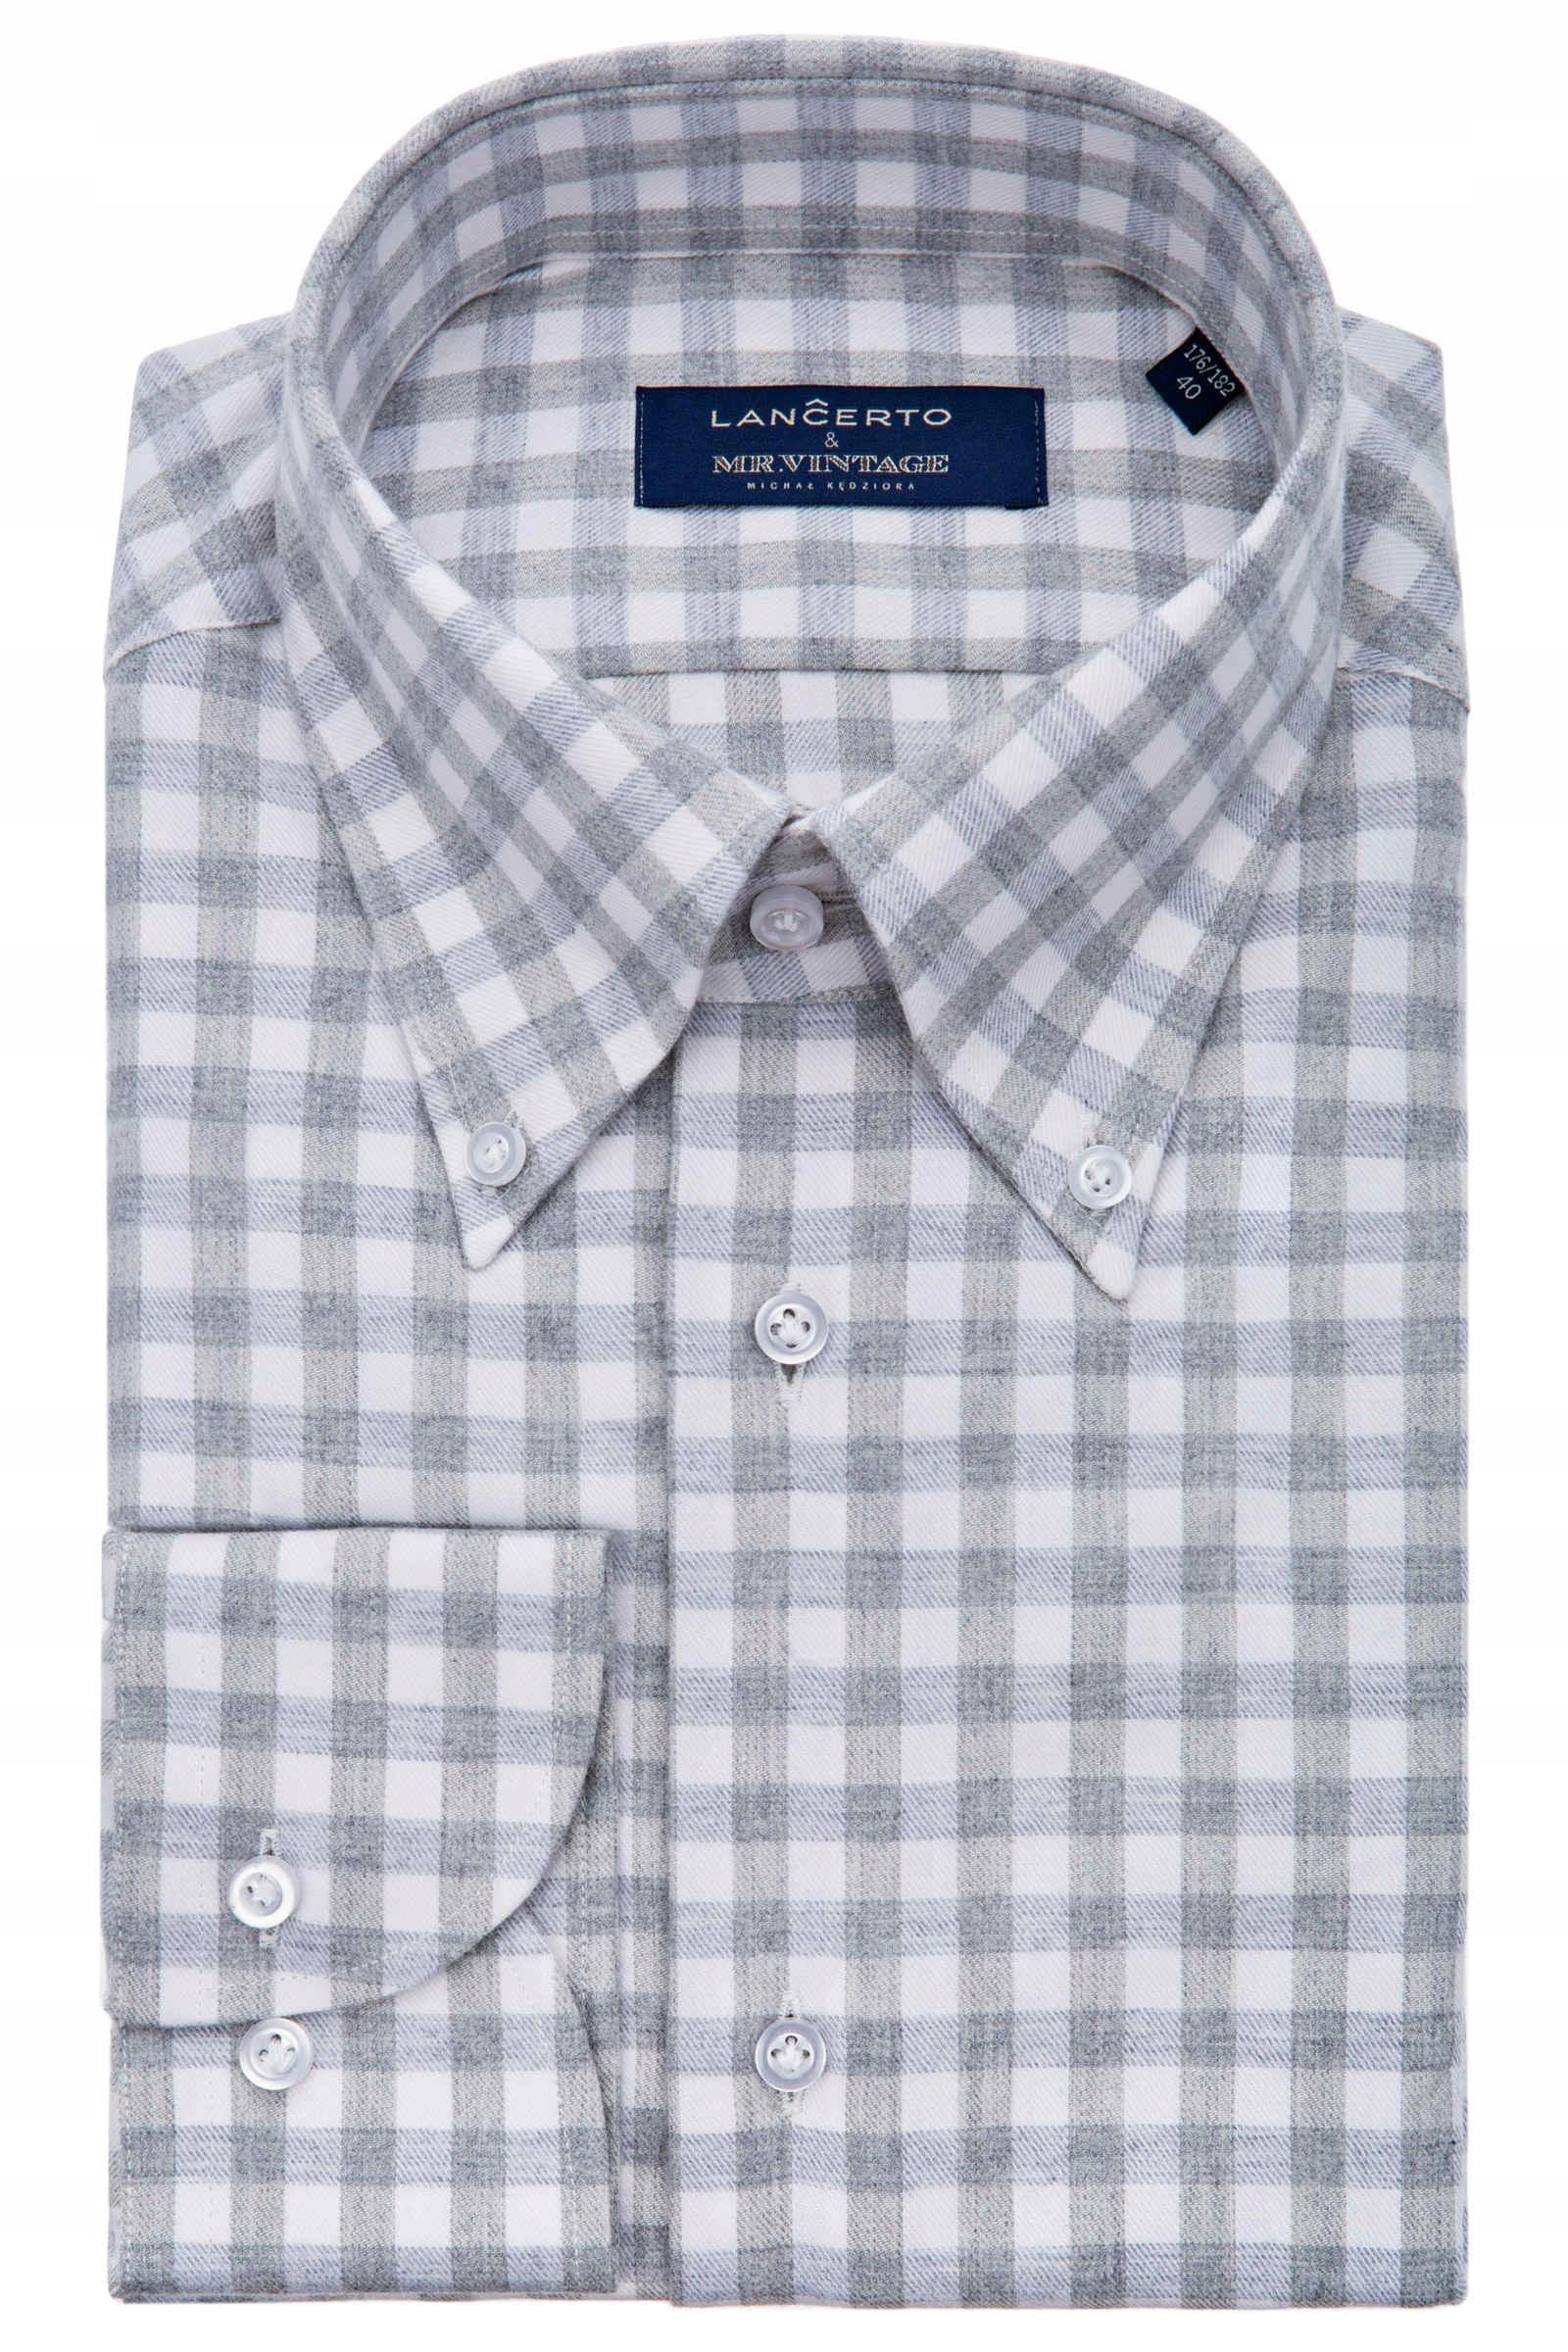 Lancerto tričko&Pán Vintage Medway 176/43